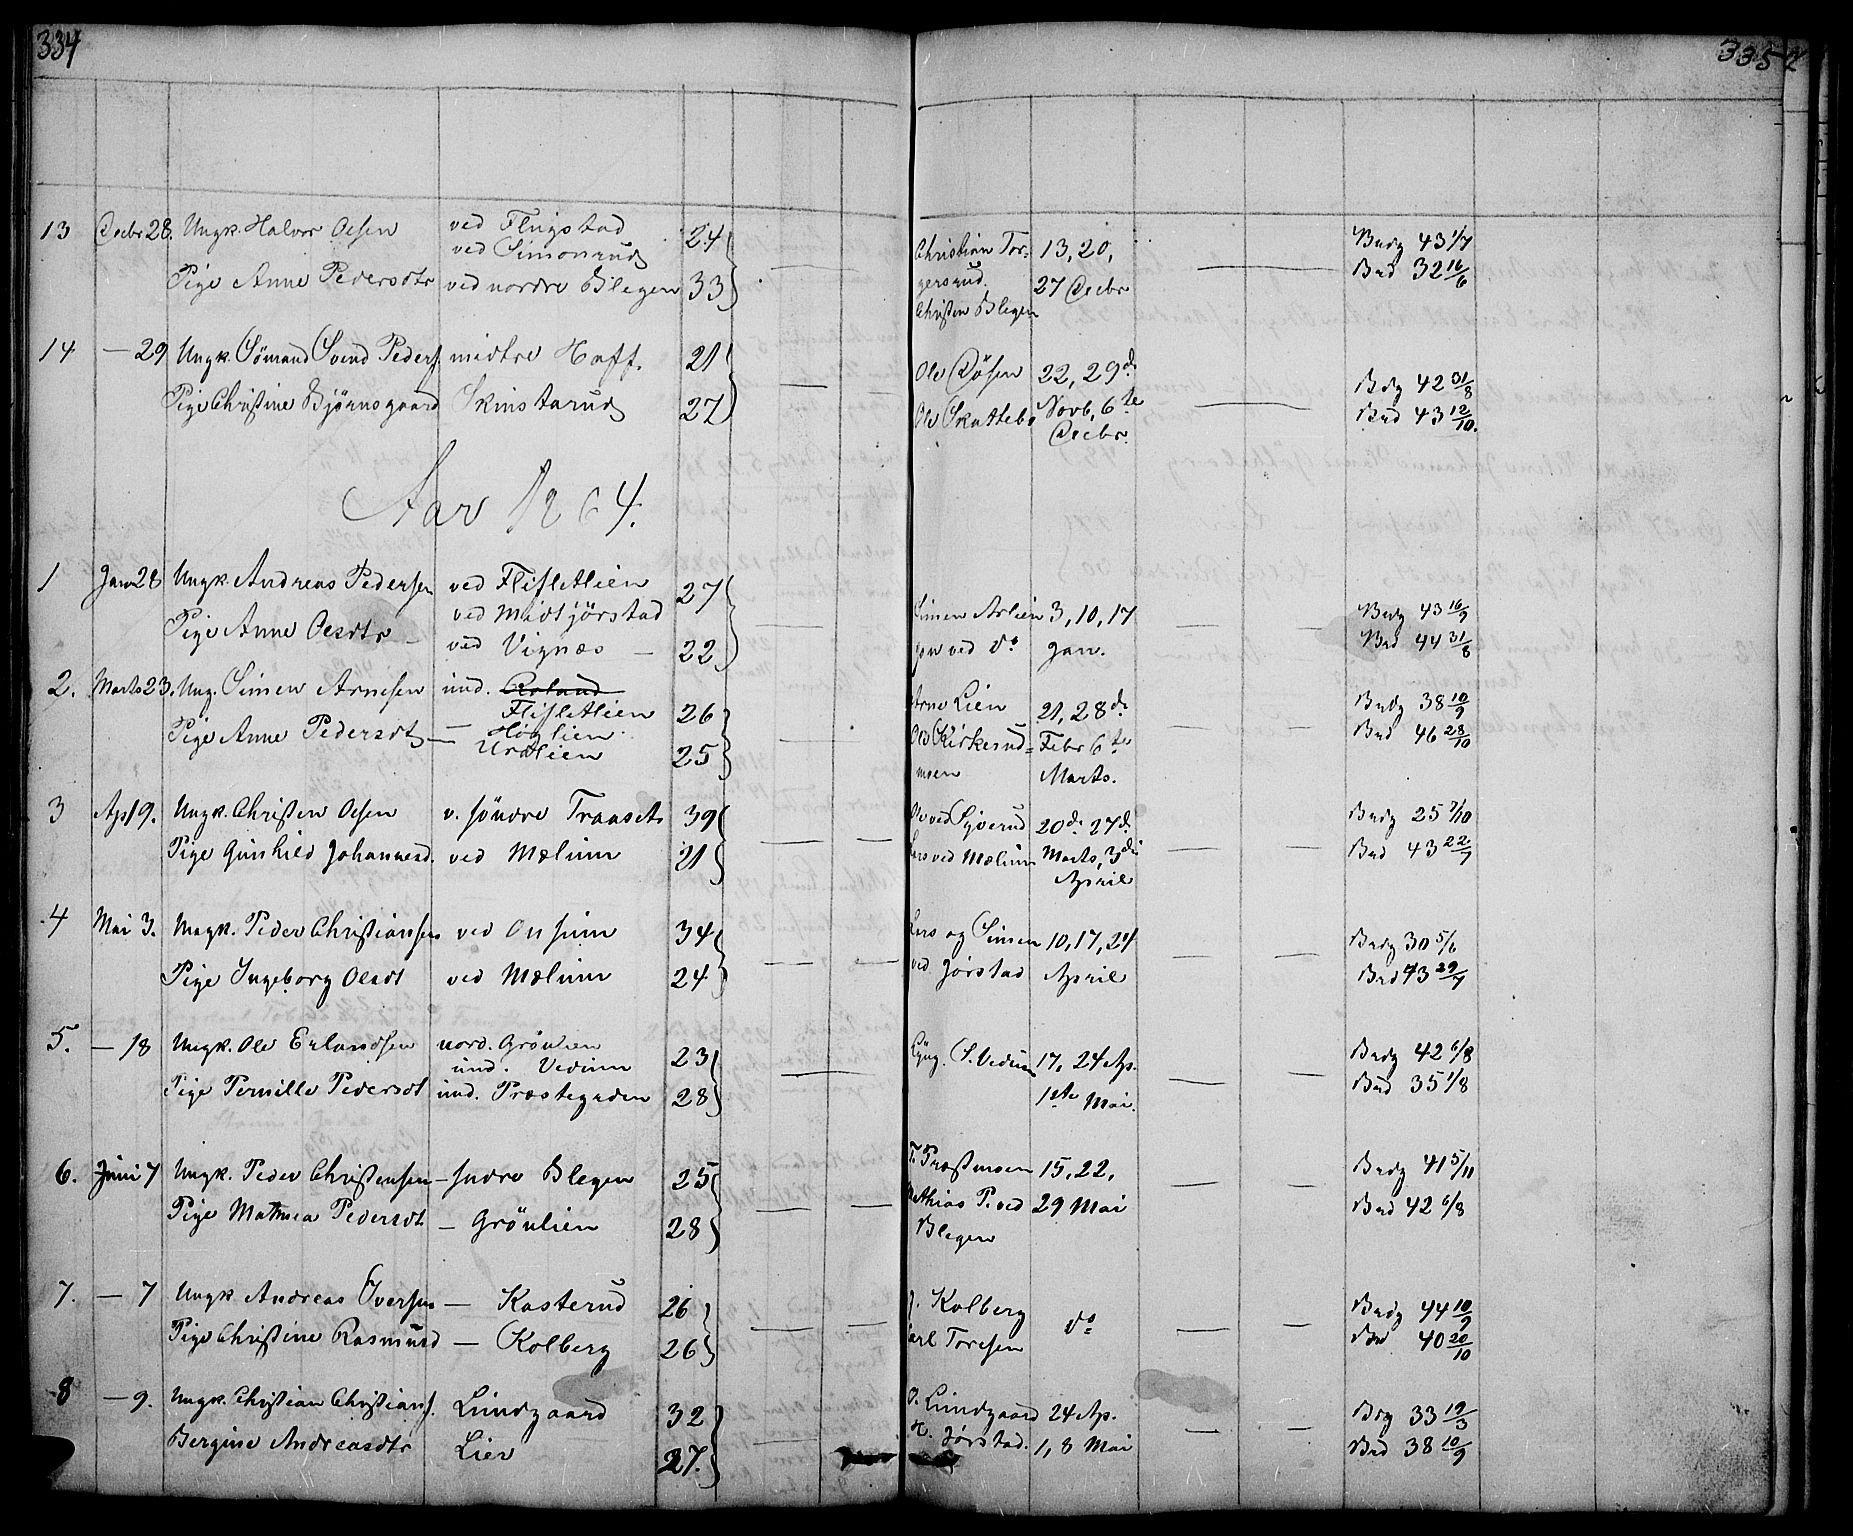 SAH, Fåberg prestekontor, Klokkerbok nr. 5, 1837-1864, s. 332-333